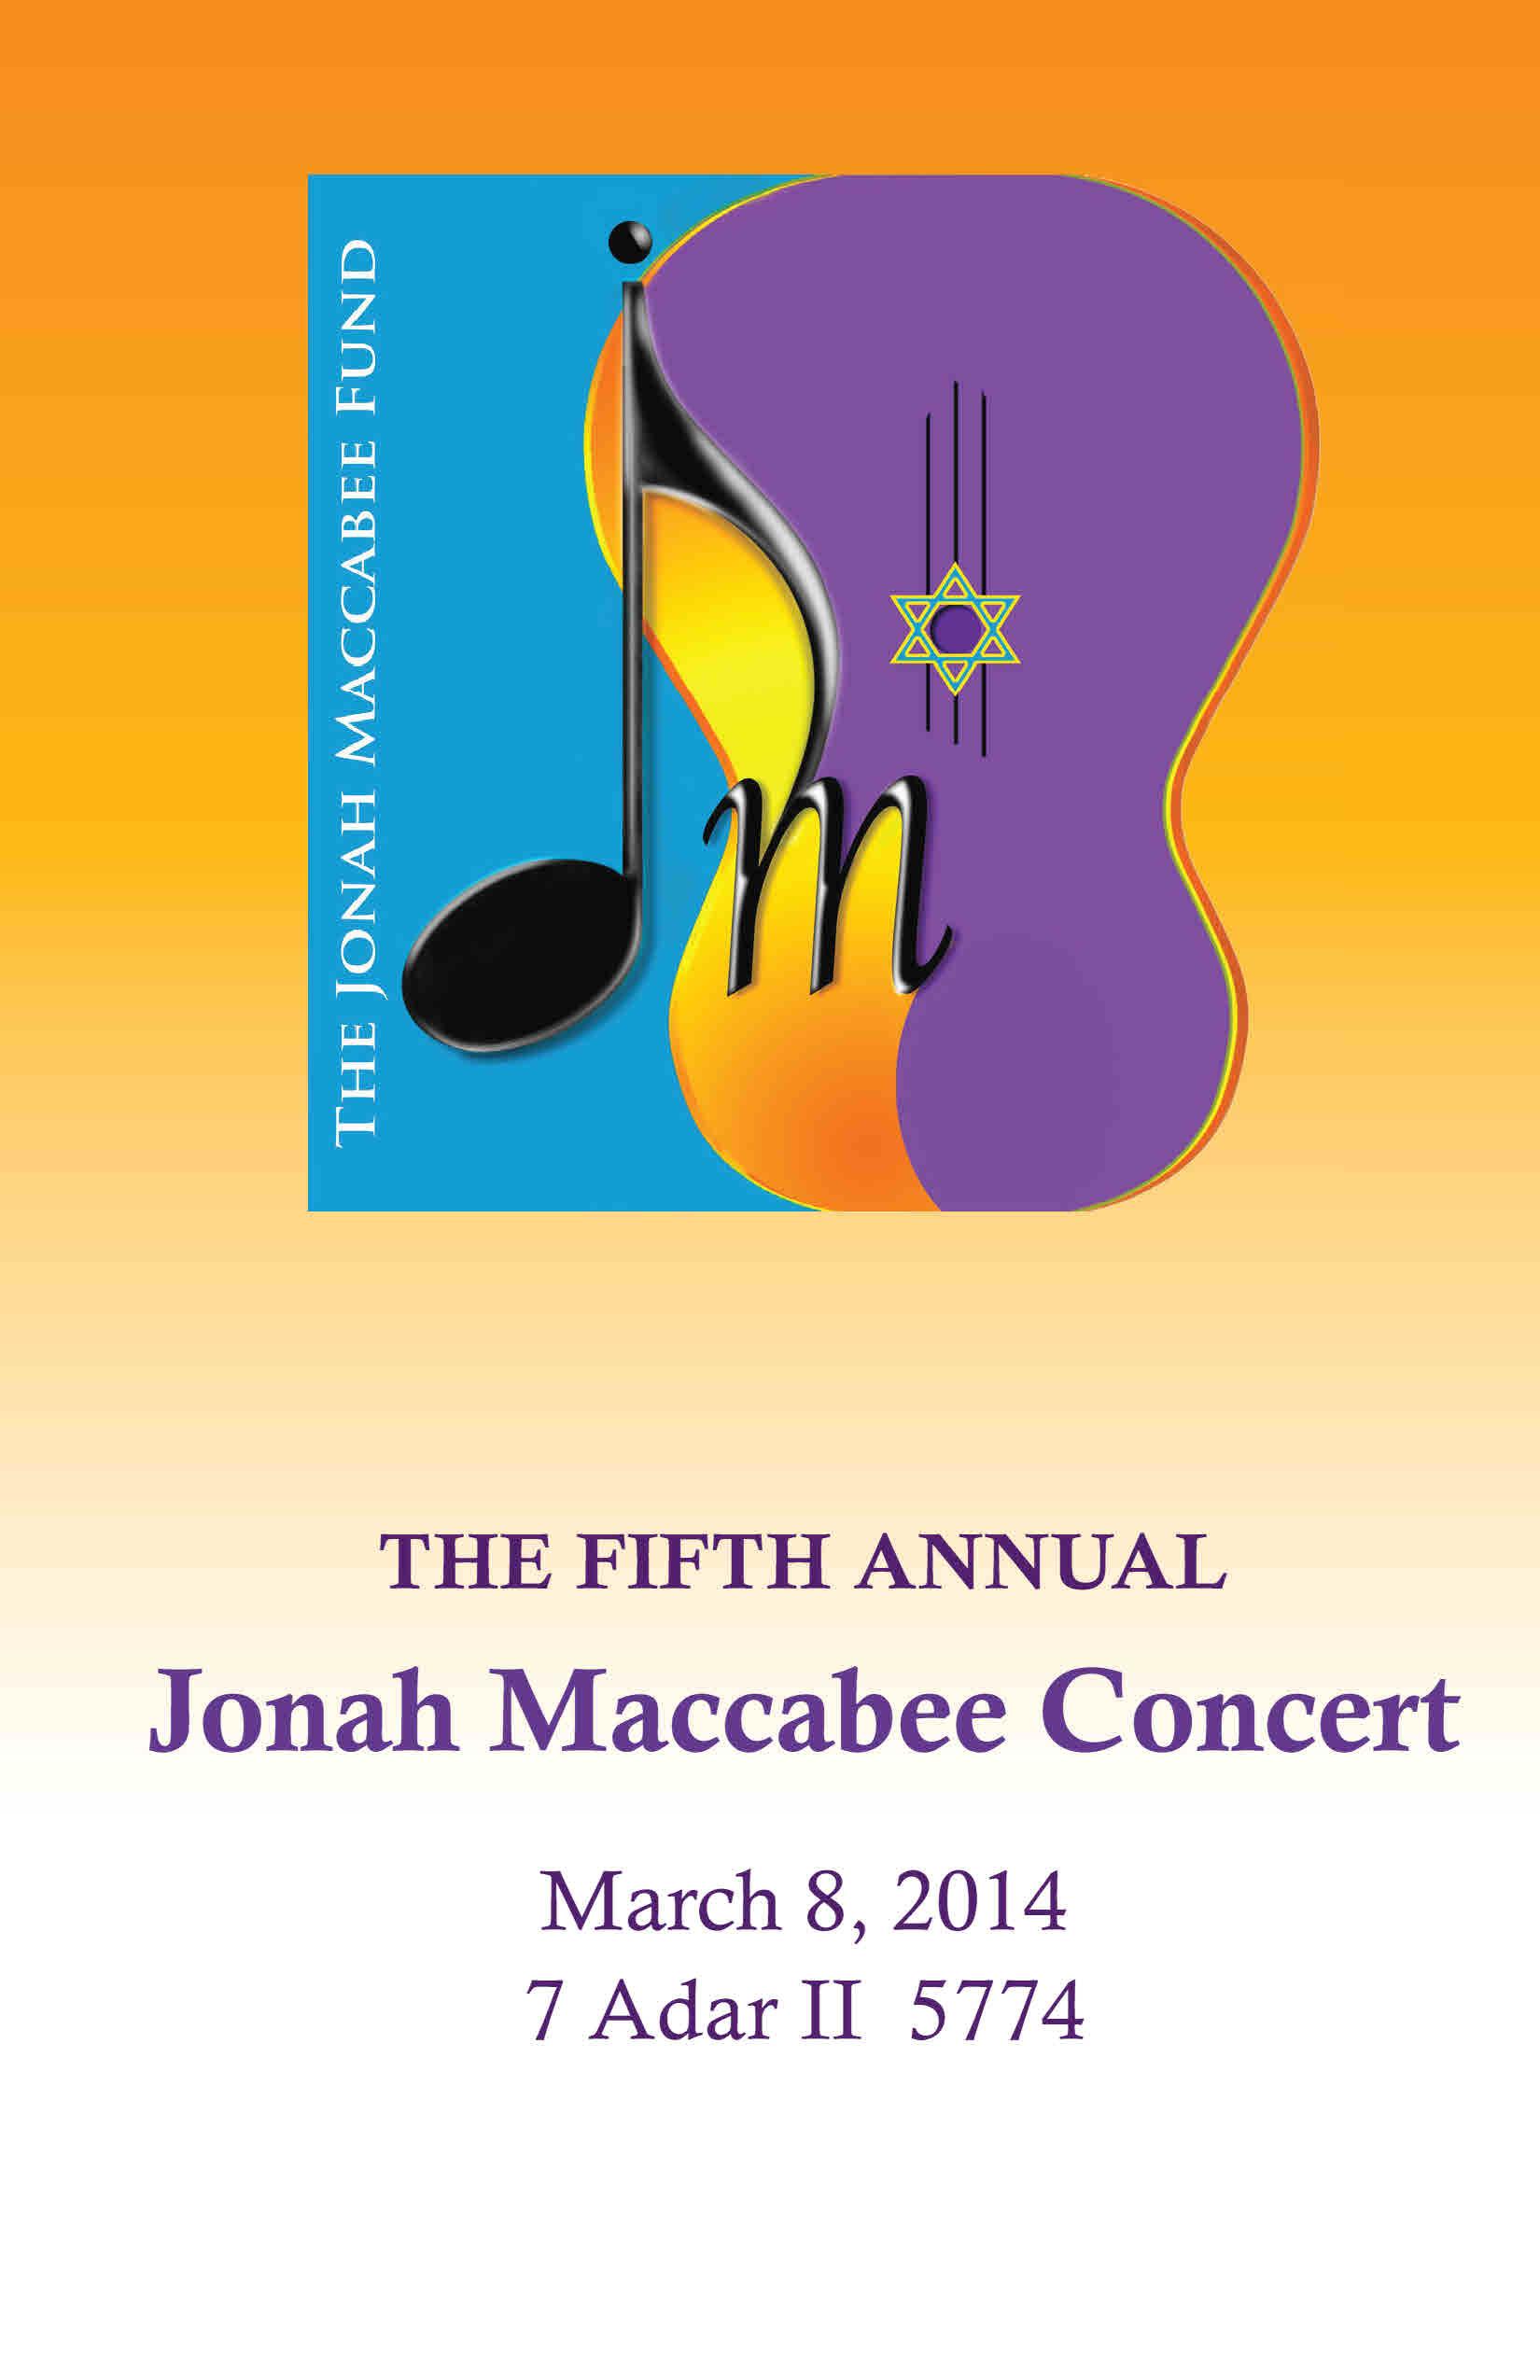 2014 Jonah Maccabee Concert